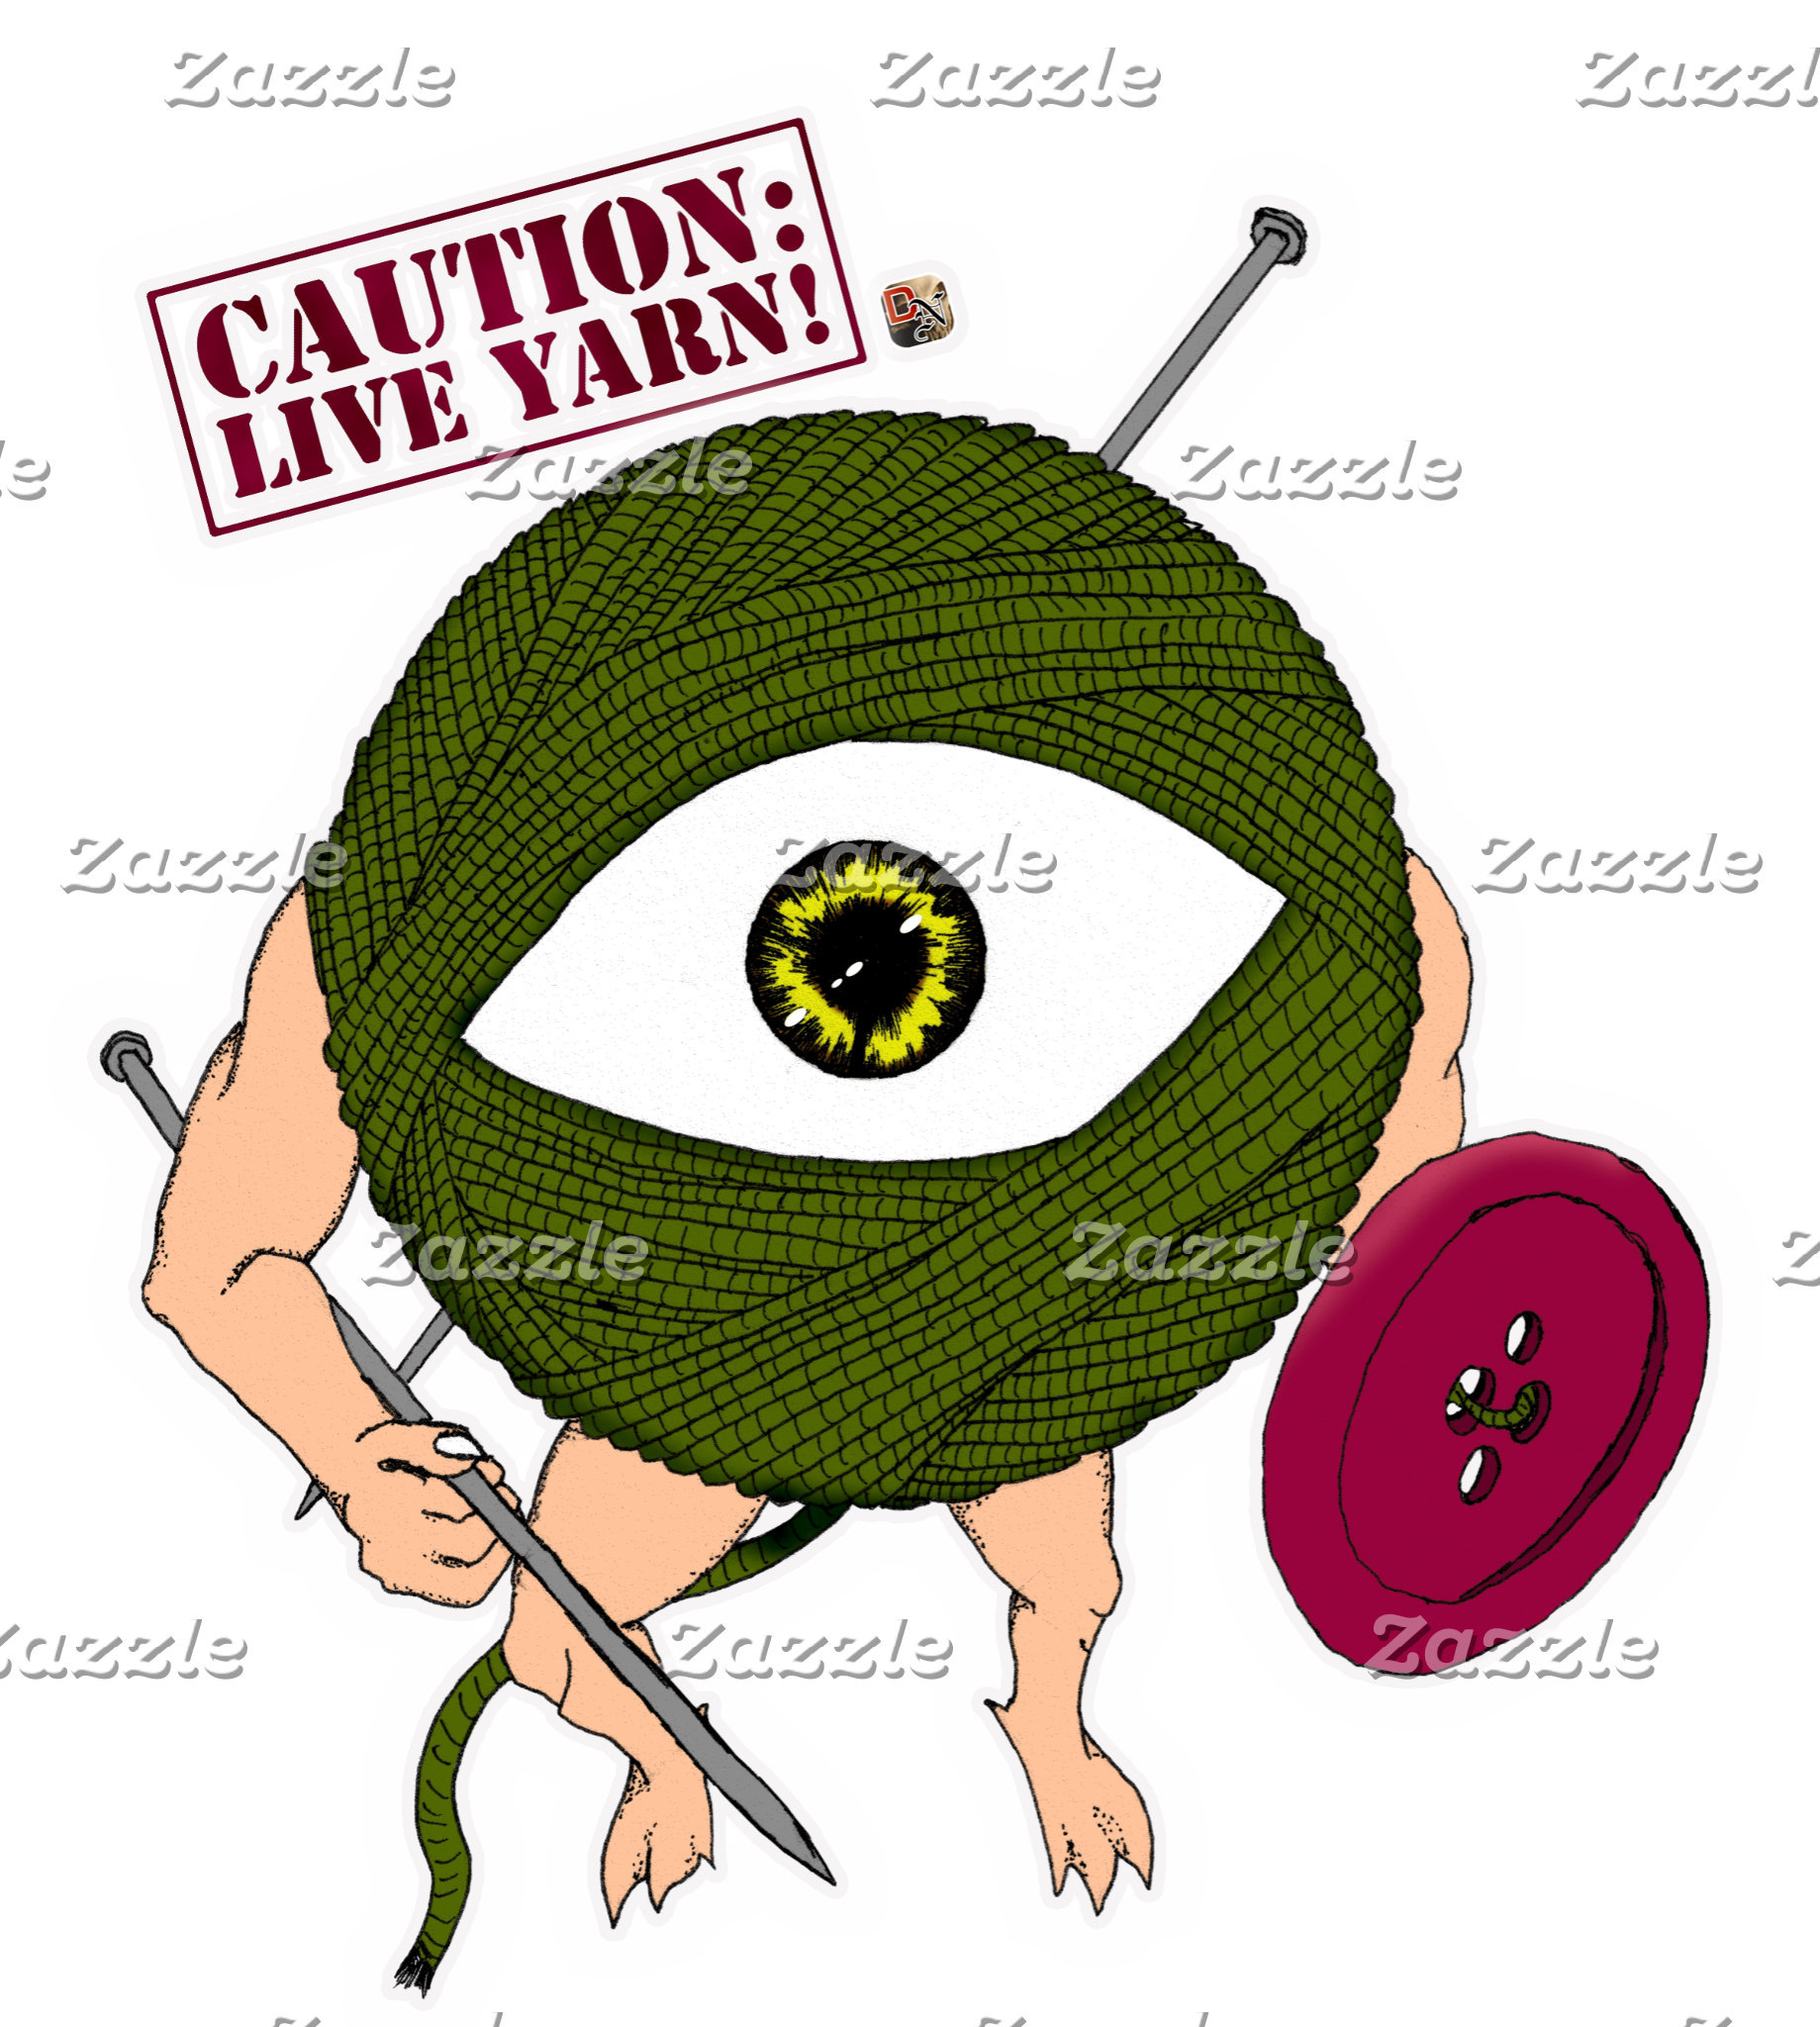 Caution: Live Yarn! Infantry